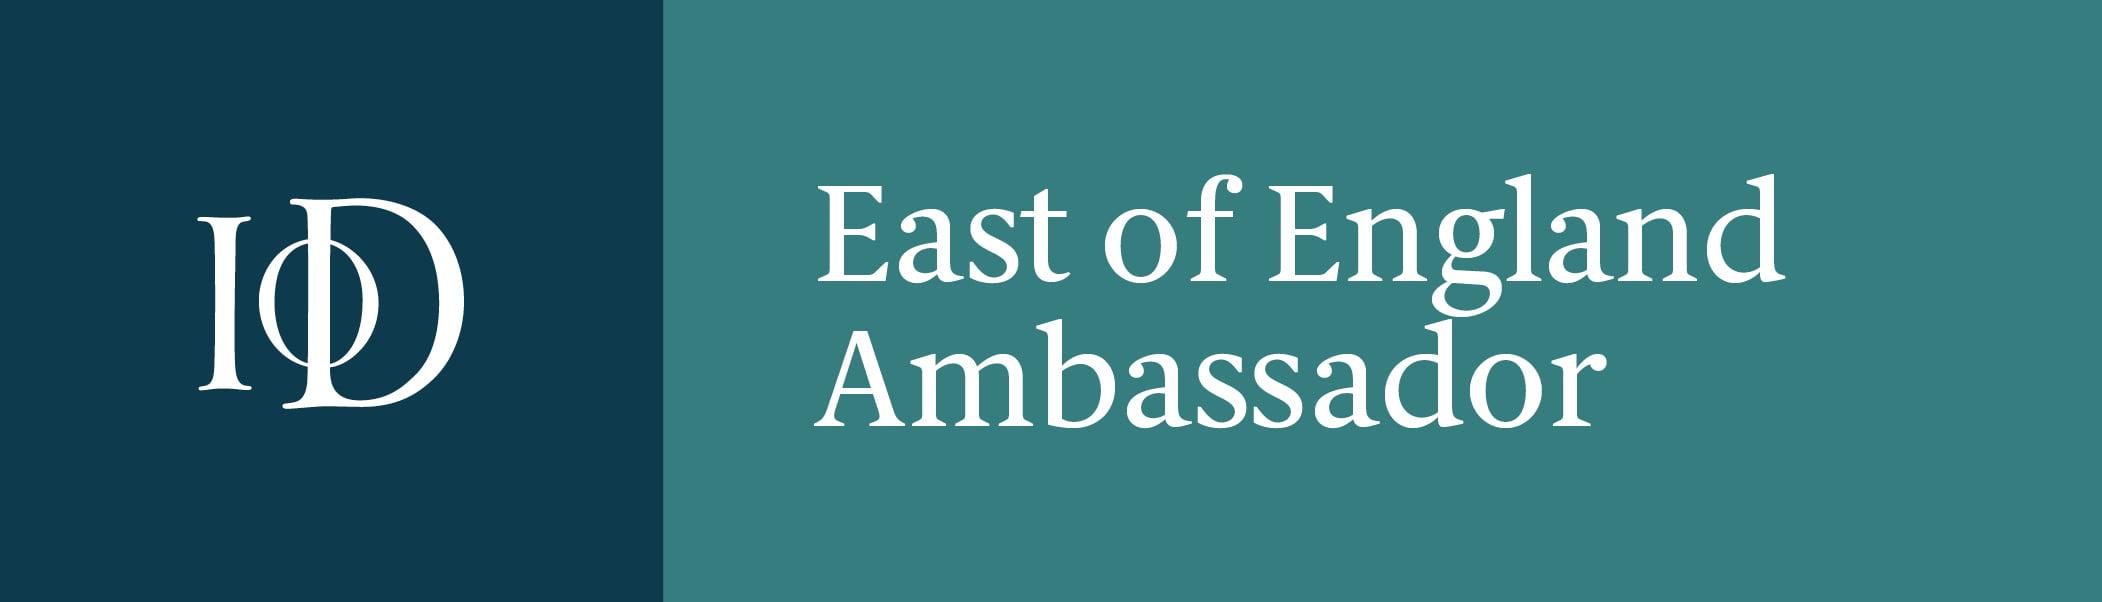 IoD East of England Ambassador